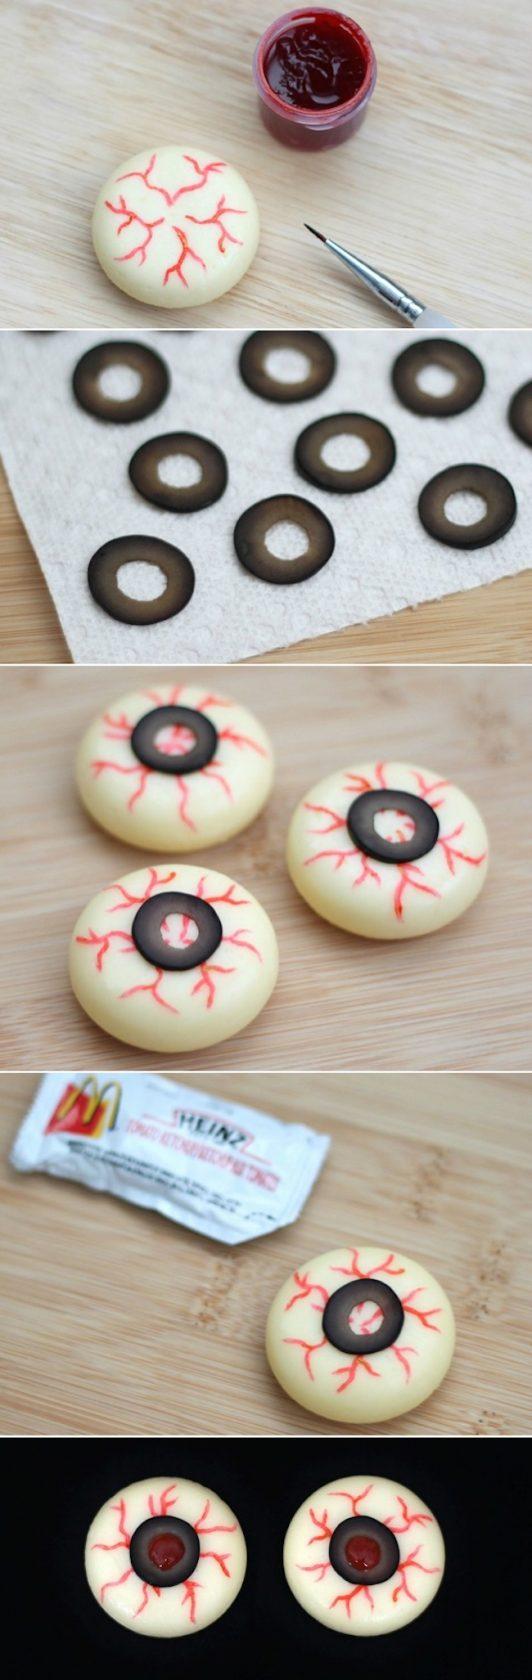 Eyeball Cheese Snack for Halloween!